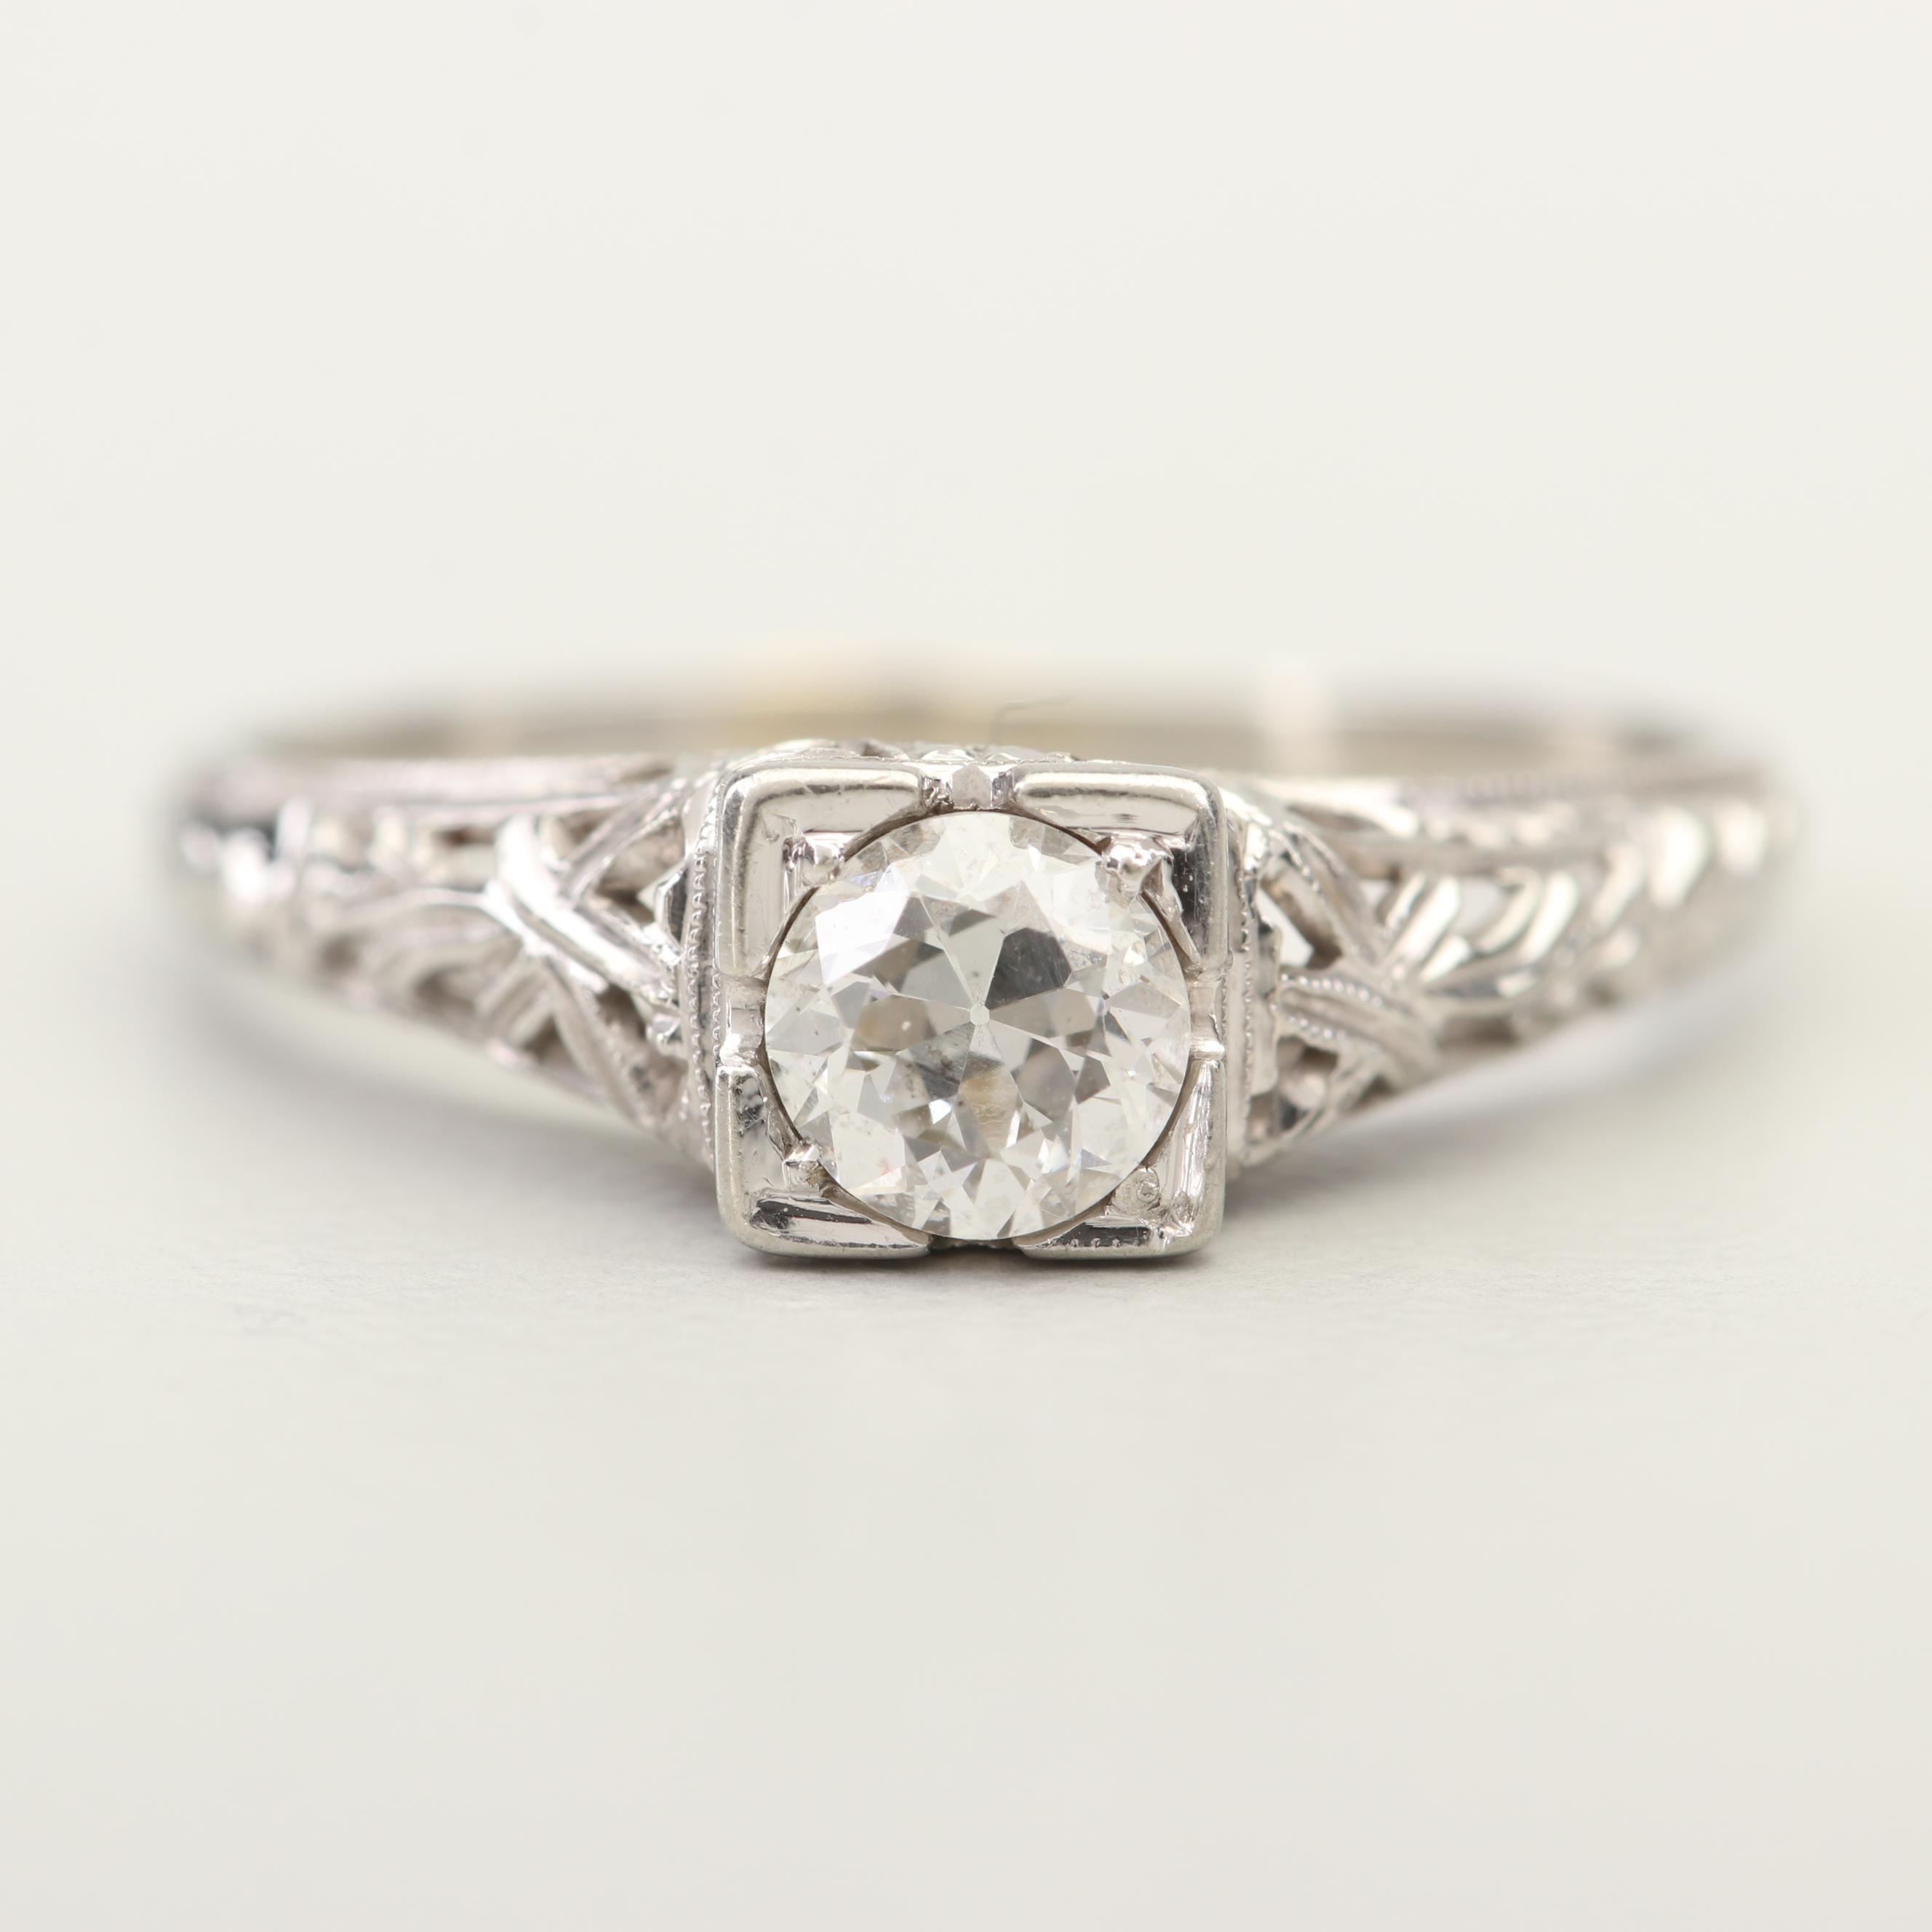 18K White Gold Filigree and Old European Cut Diamond Ring